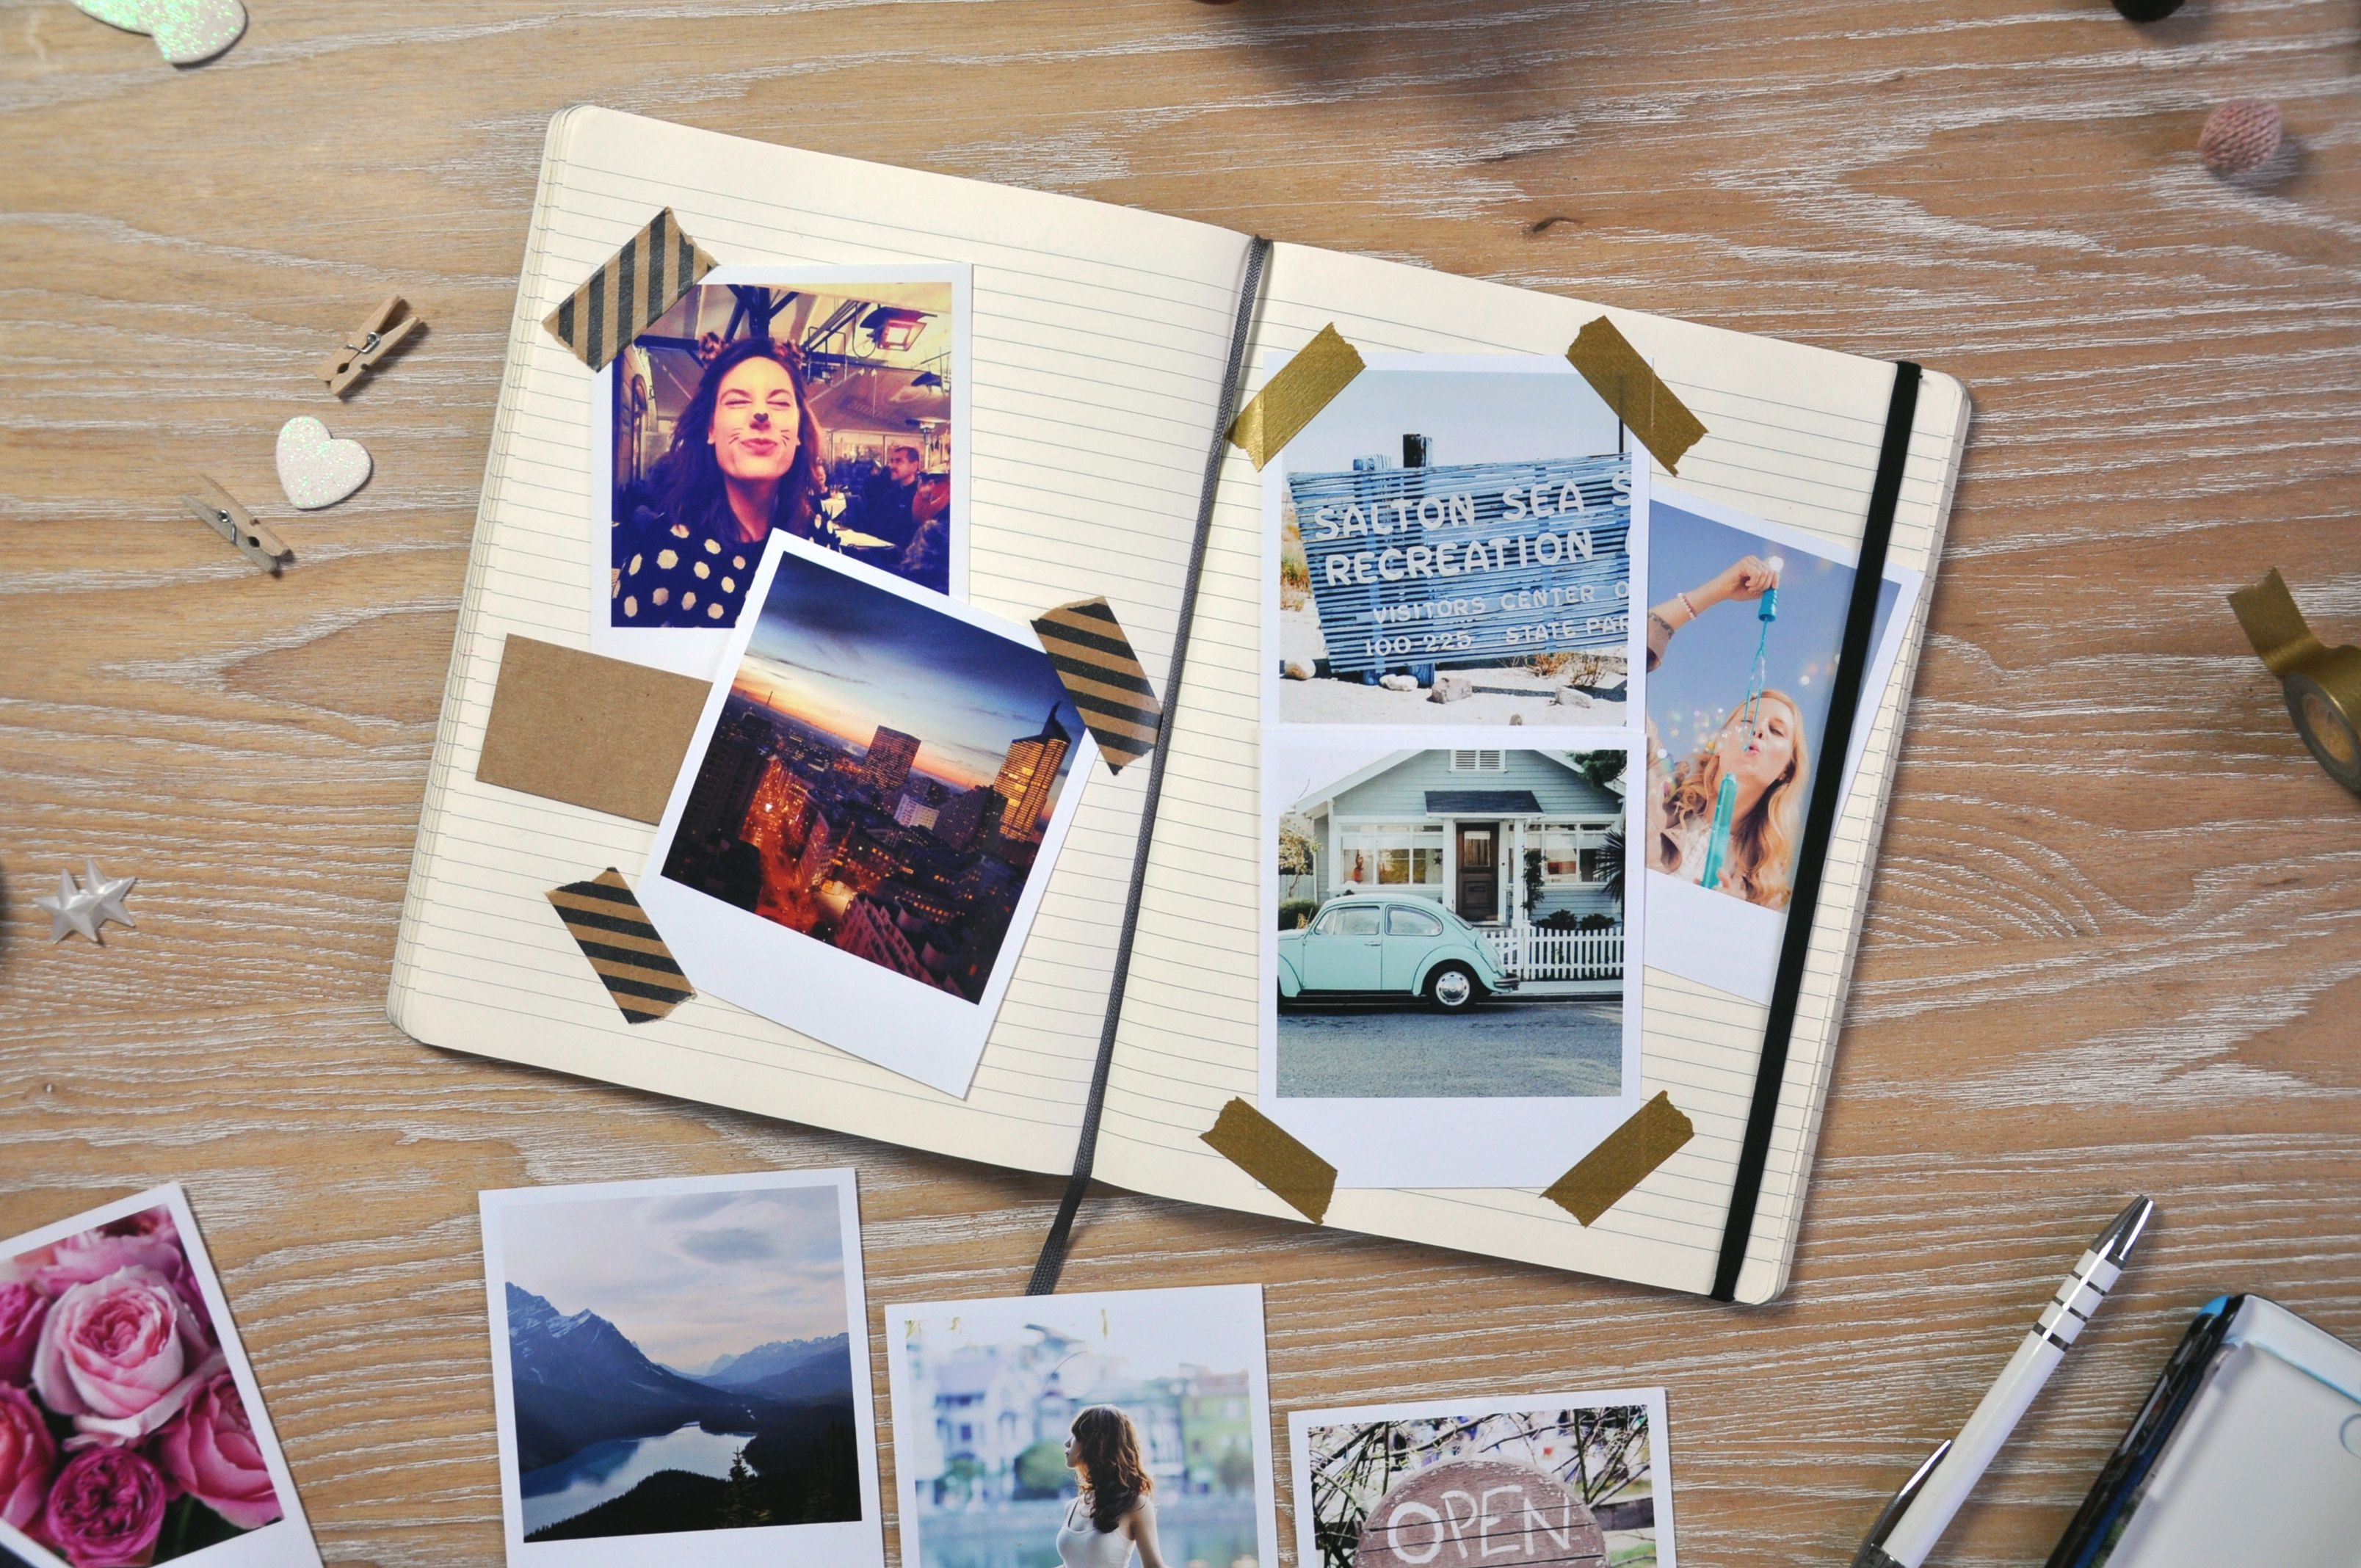 What about making a scrapbook with your prints? :)  #polagram #prints   Pola Style 10x12 0,39€ I 0,29£ I 0,45$ Classic 10x10 0,39€ I 0,29£ I 0,45$ Regular 10x13 0,39€ I 0,29£ I 0,45$  www.polagr.am